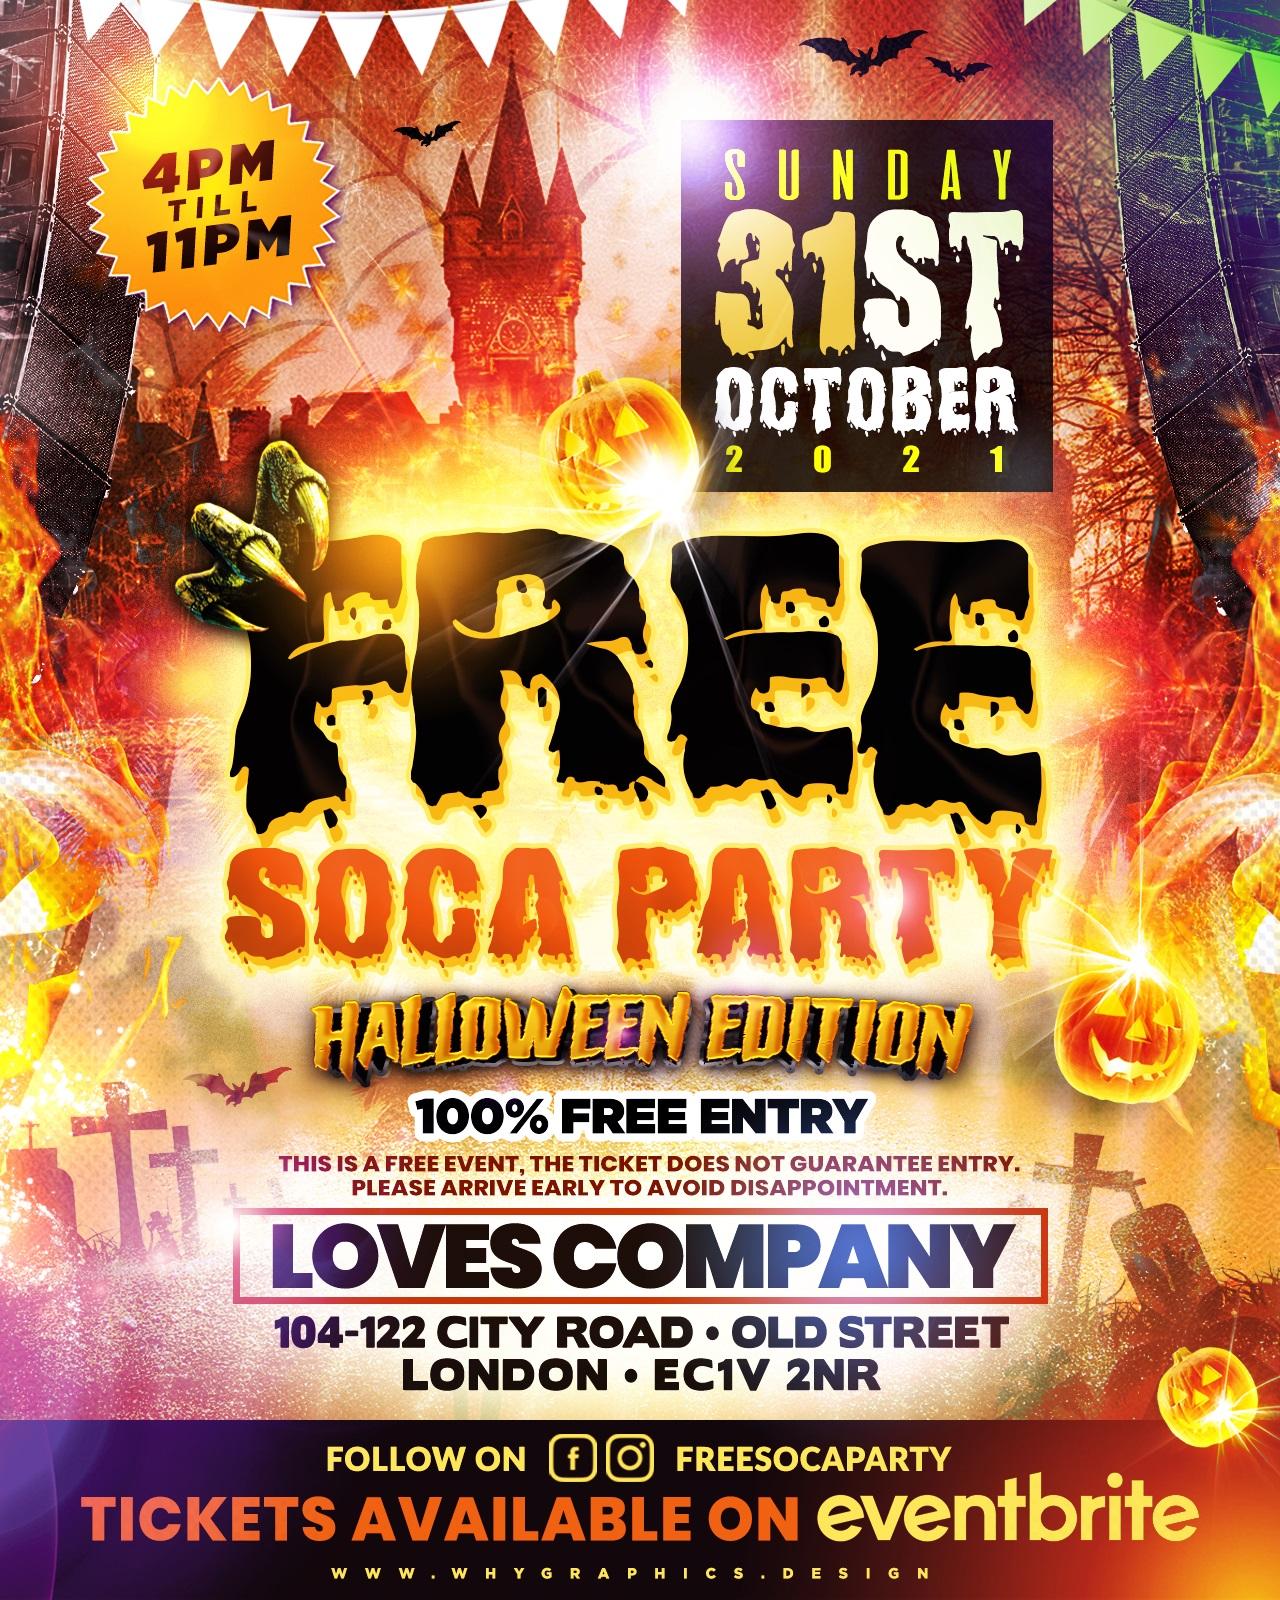 Free Soca Party - Halloween Edition